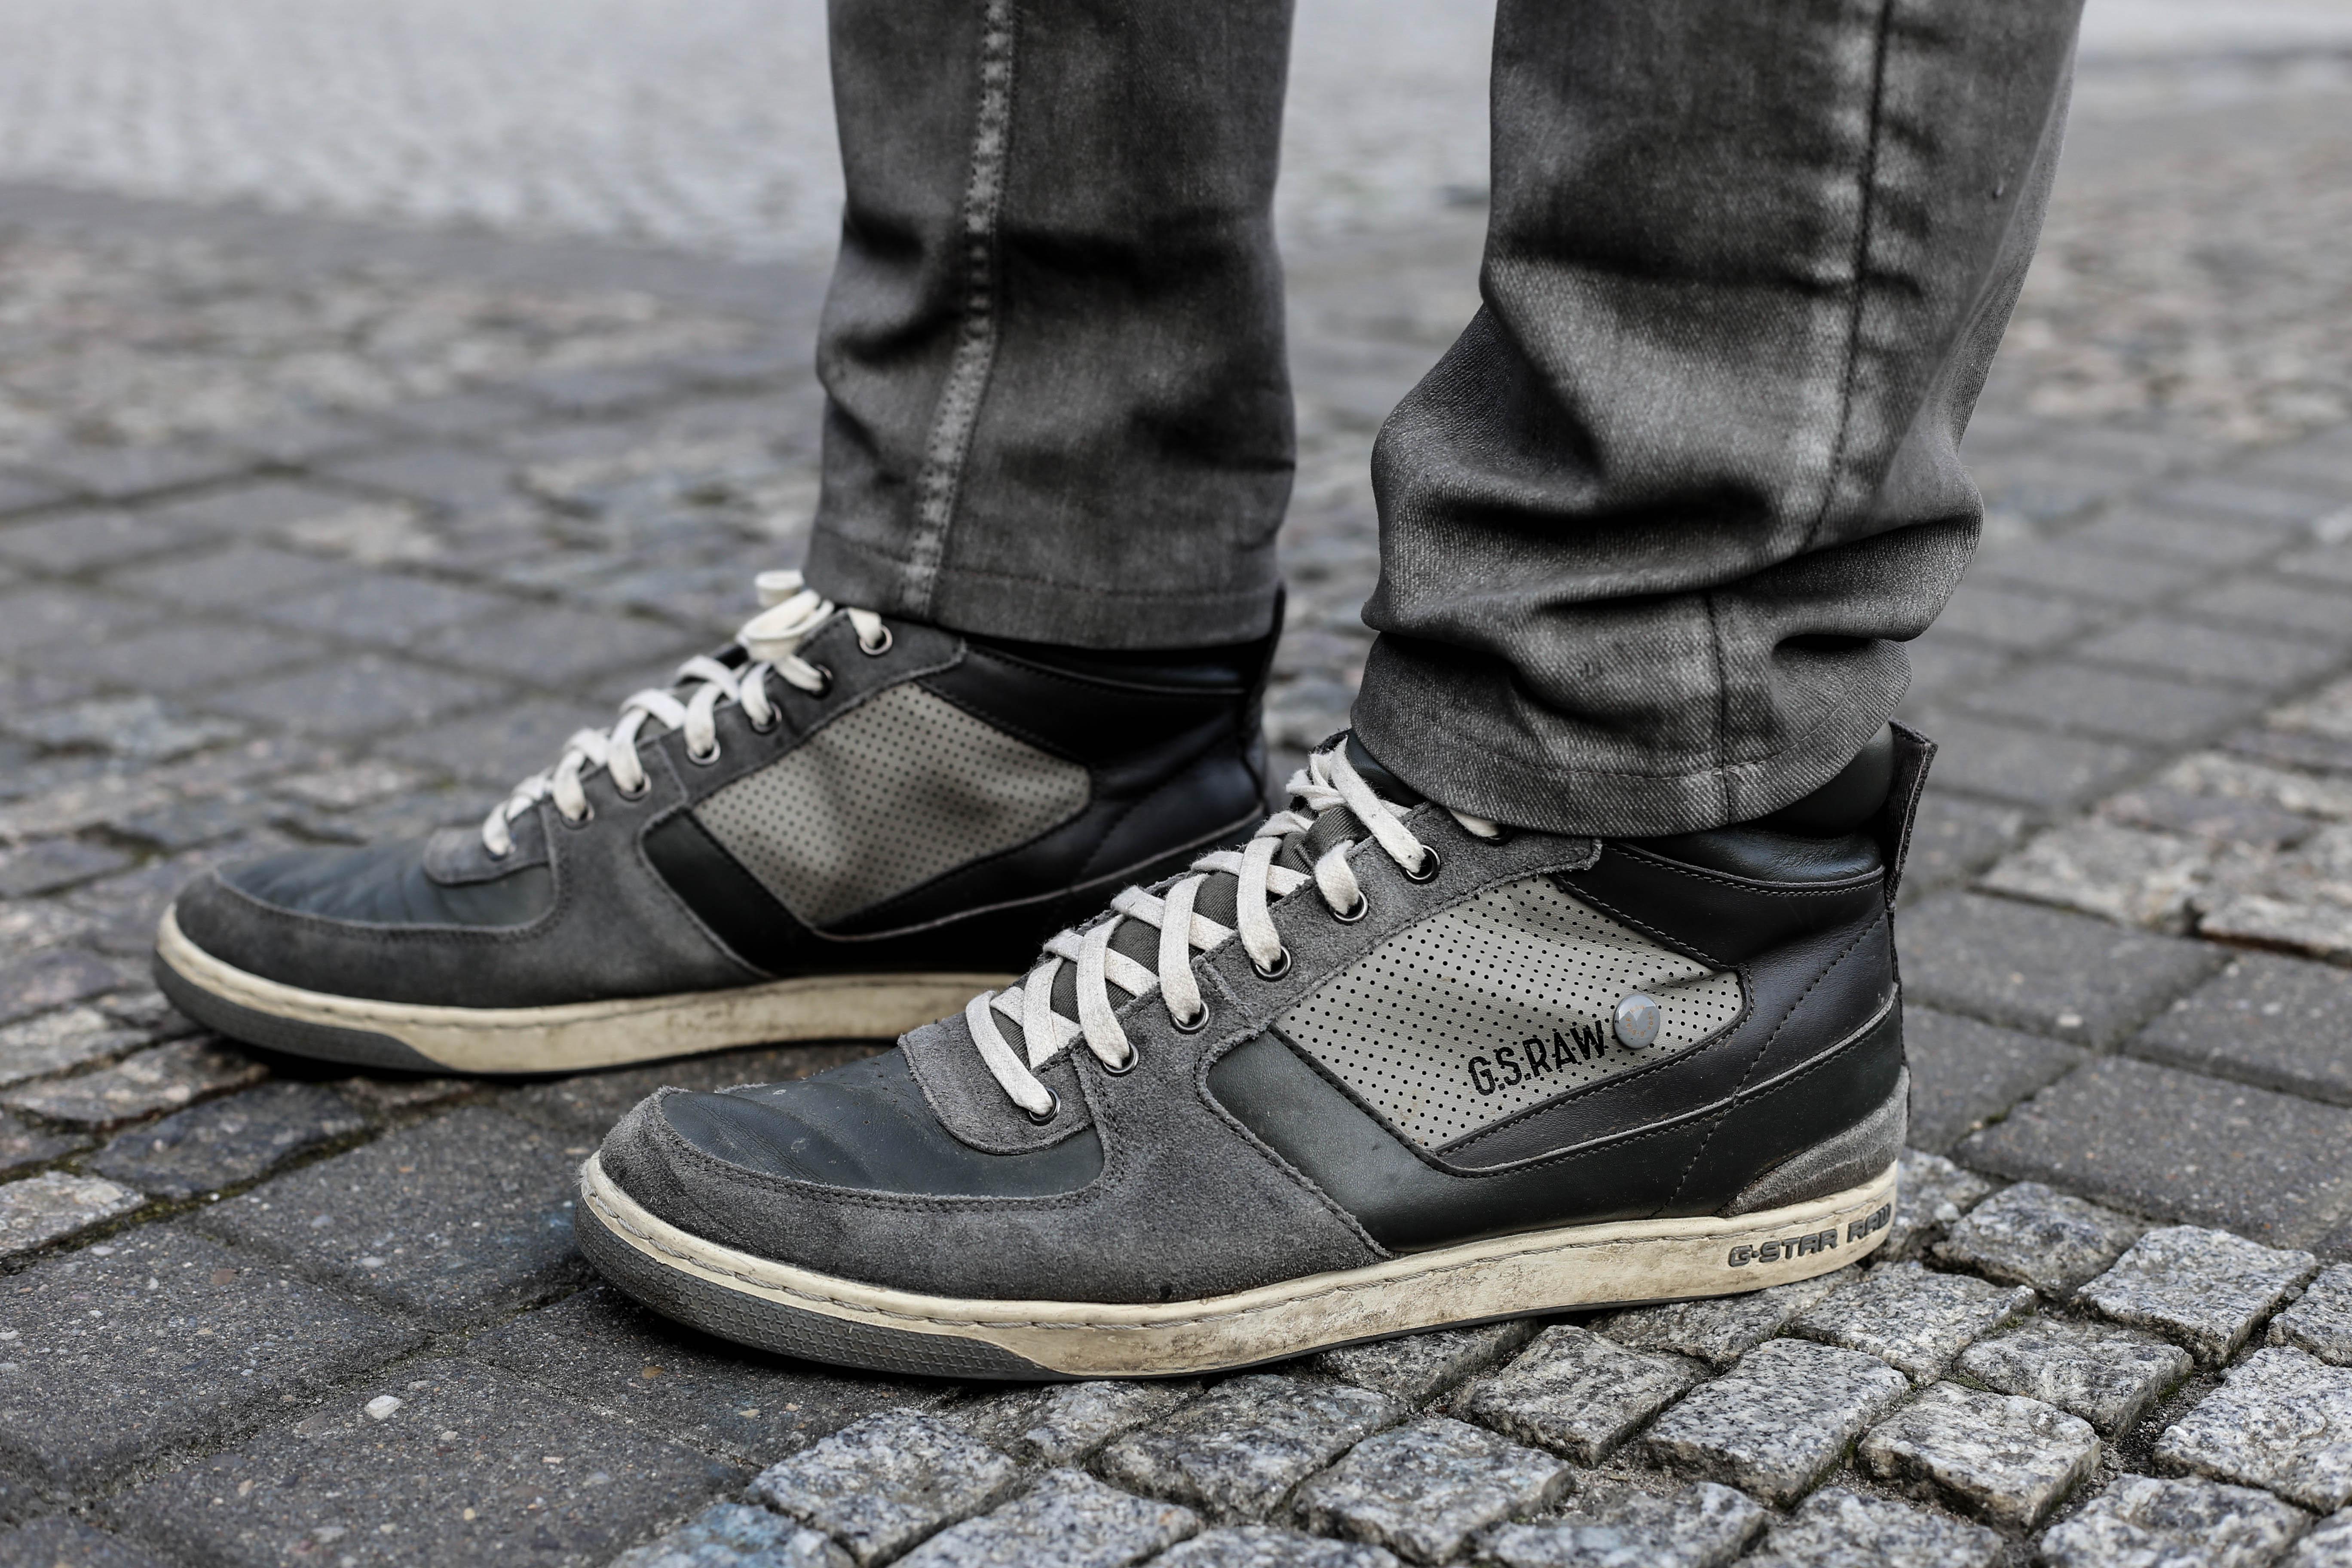 kariertes-hemd-maennerblog-fashionblog-berlin-outfit-graue-jeans_4121